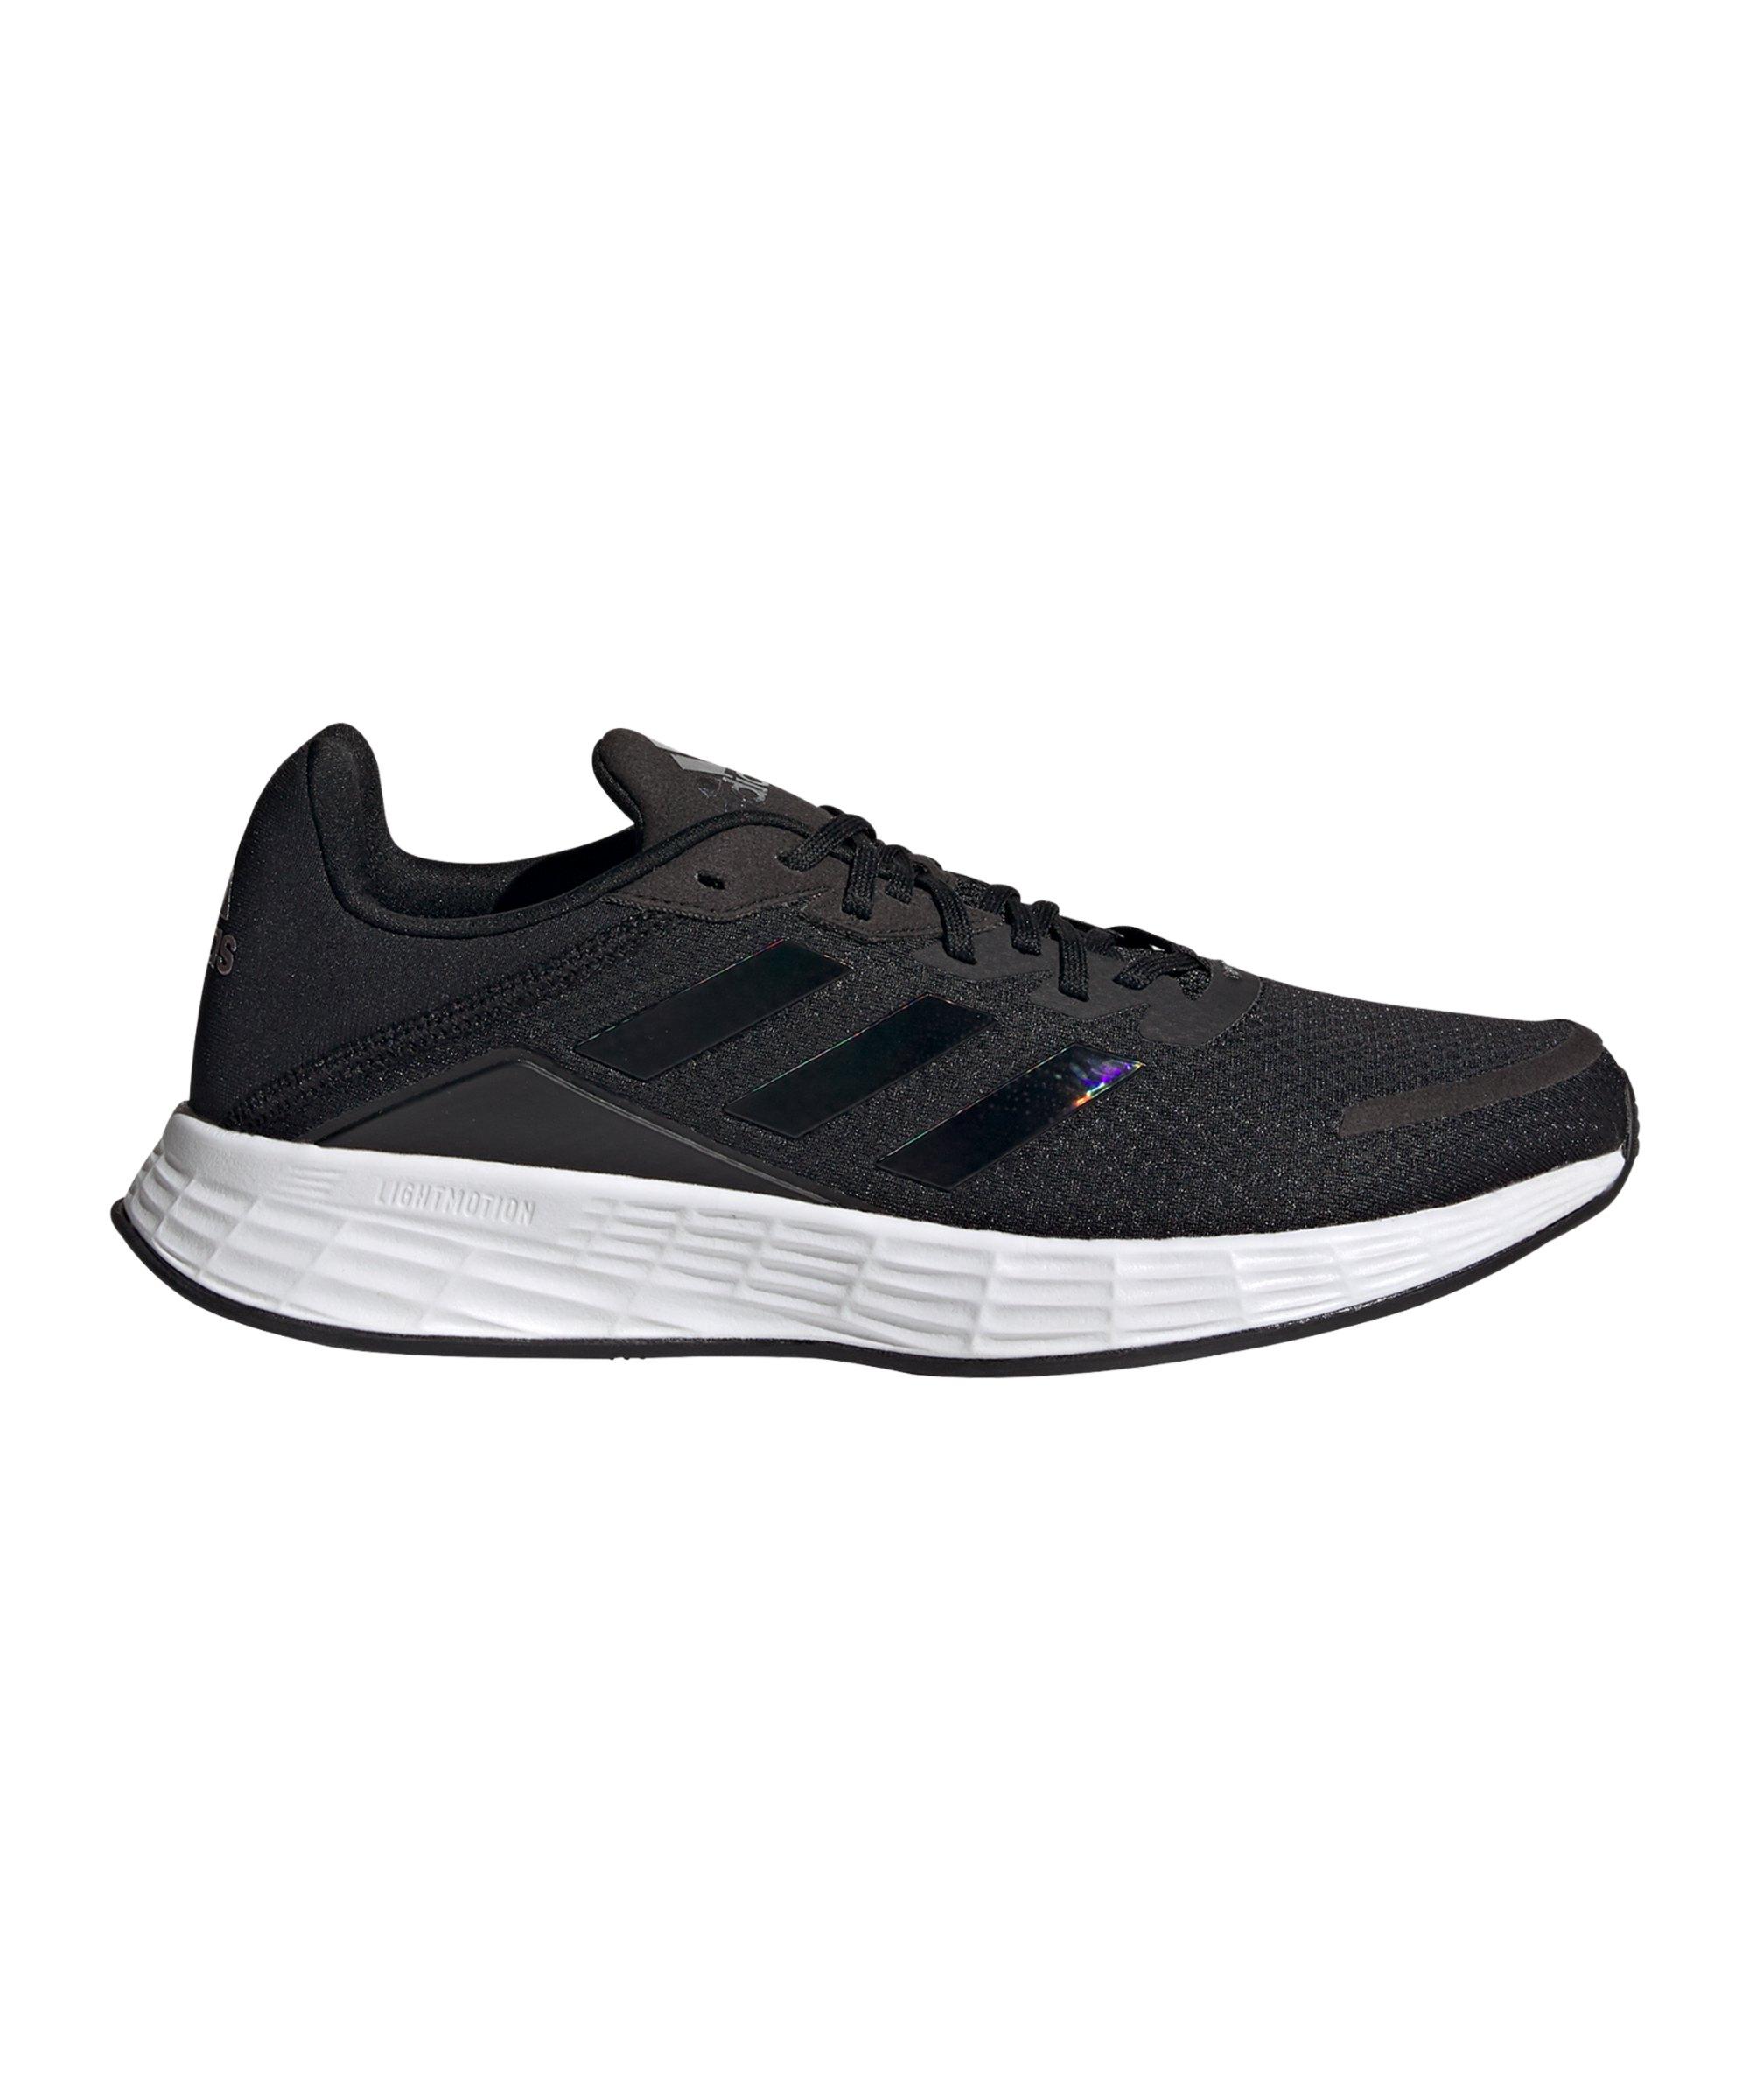 adidas Duramo SL Running Schwarz Grau - schwarz